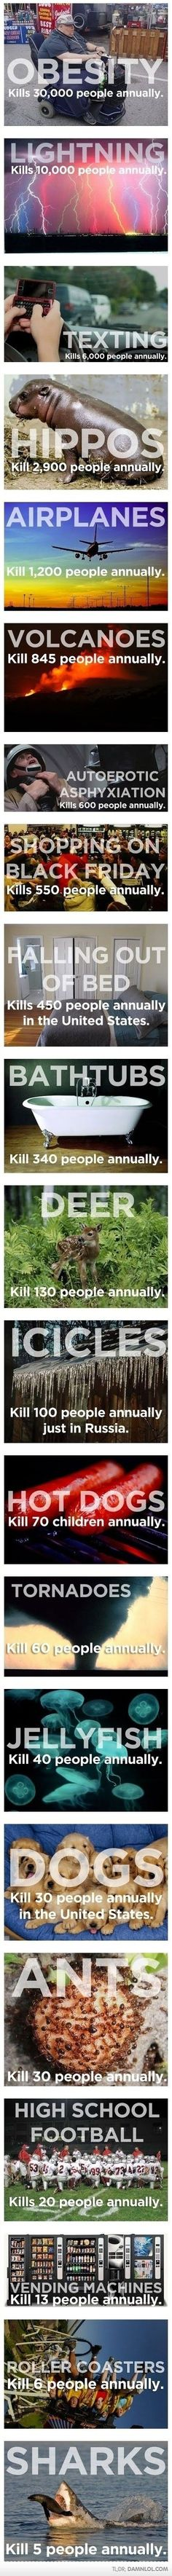 Annual Death Causes